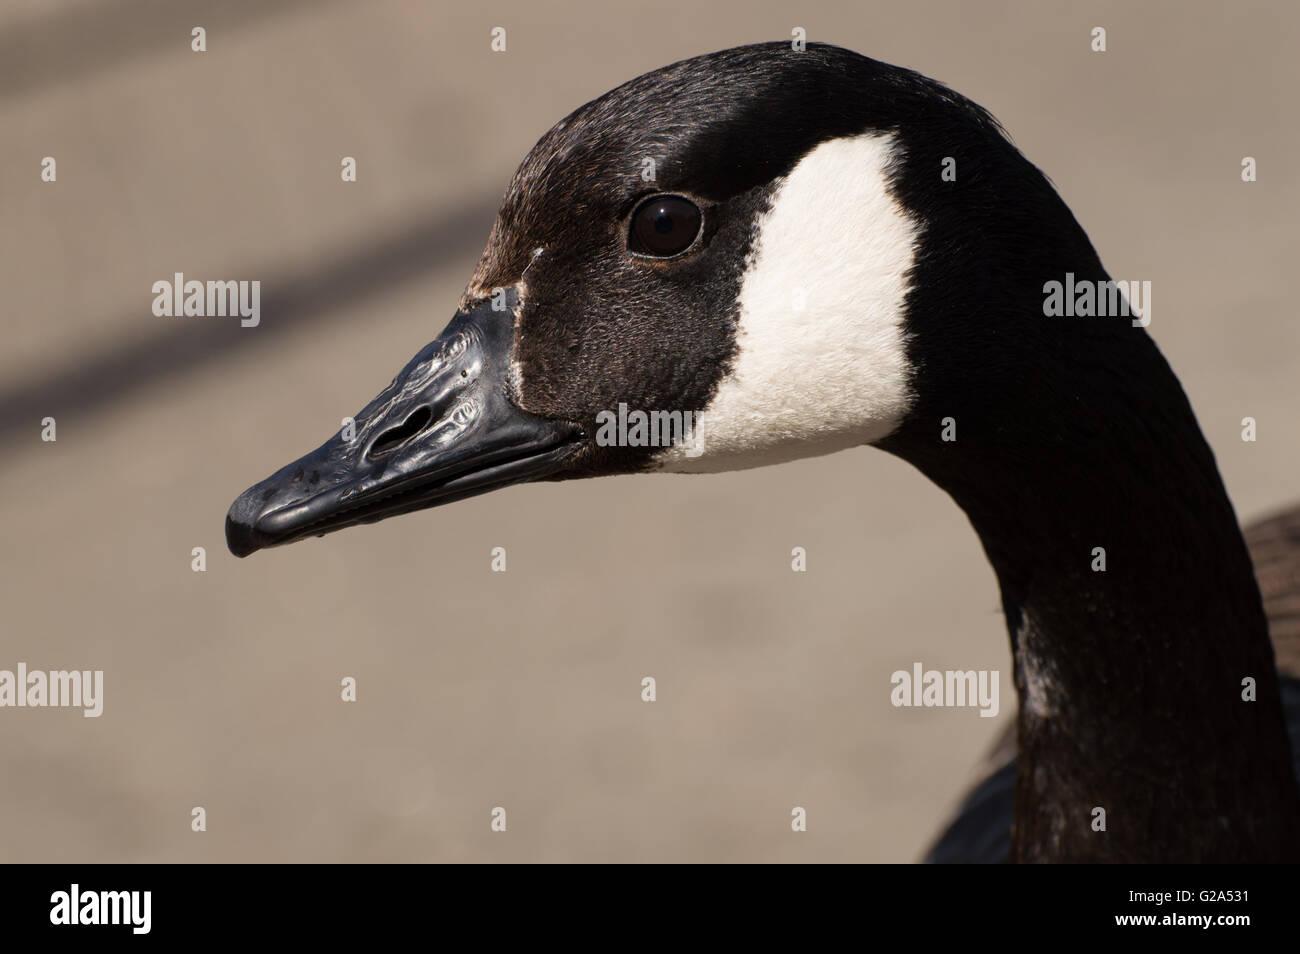 A close up portrait of a canada goose branta canadensis stock a close up portrait of a canada goose branta canadensis biocorpaavc Gallery